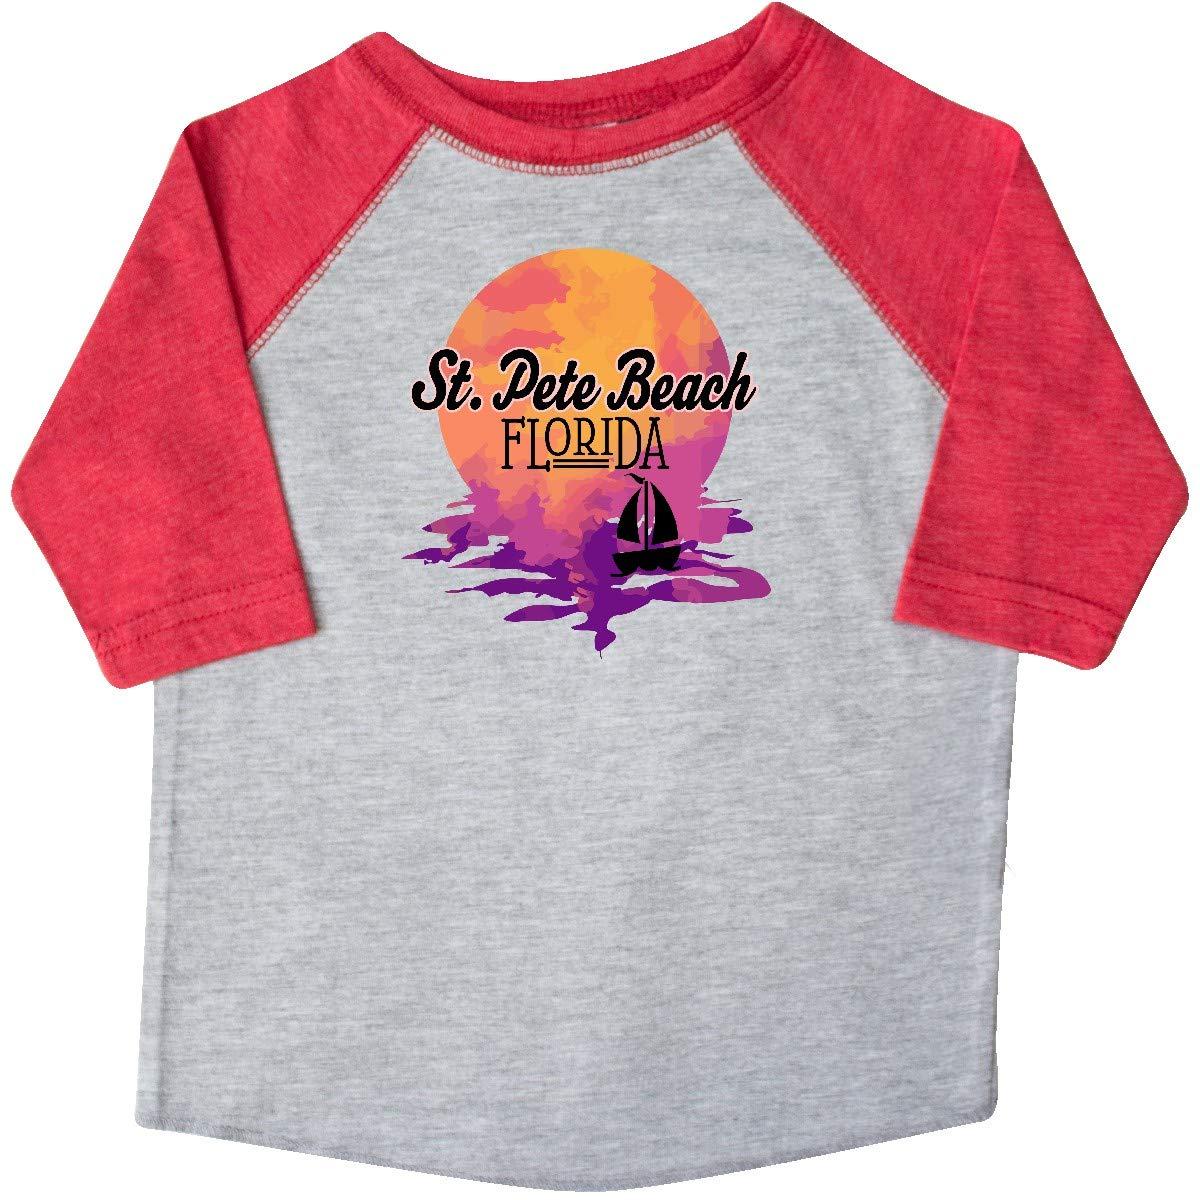 inktastic St Pete Beach Florida Sunset Toddler T-Shirt